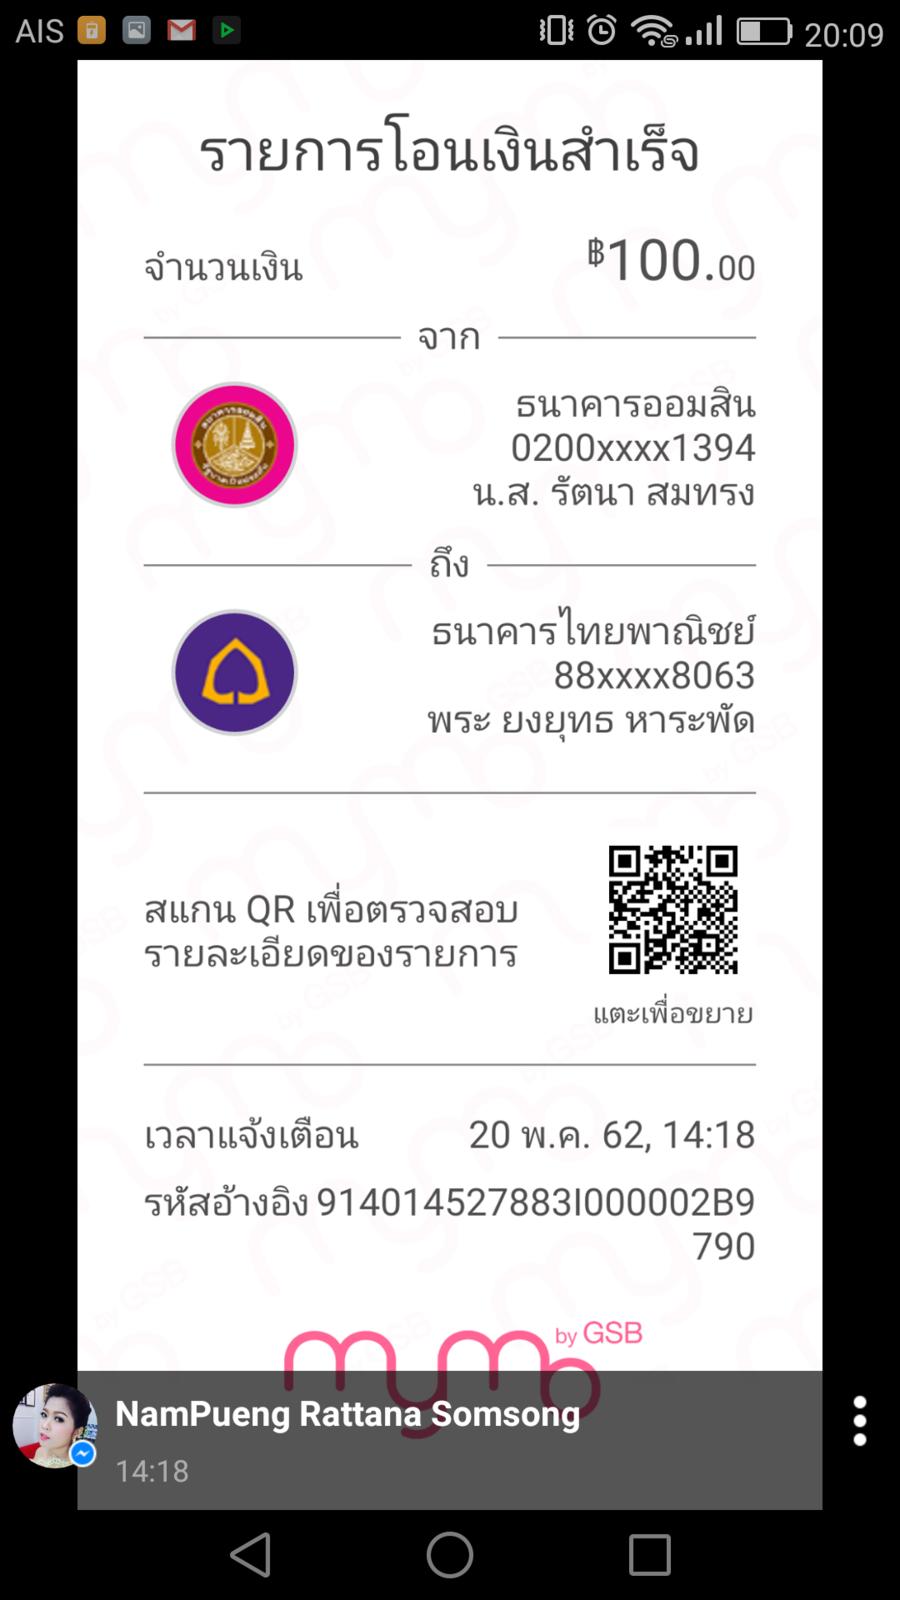 Screenshot_2019-05-20-20-09-37.png